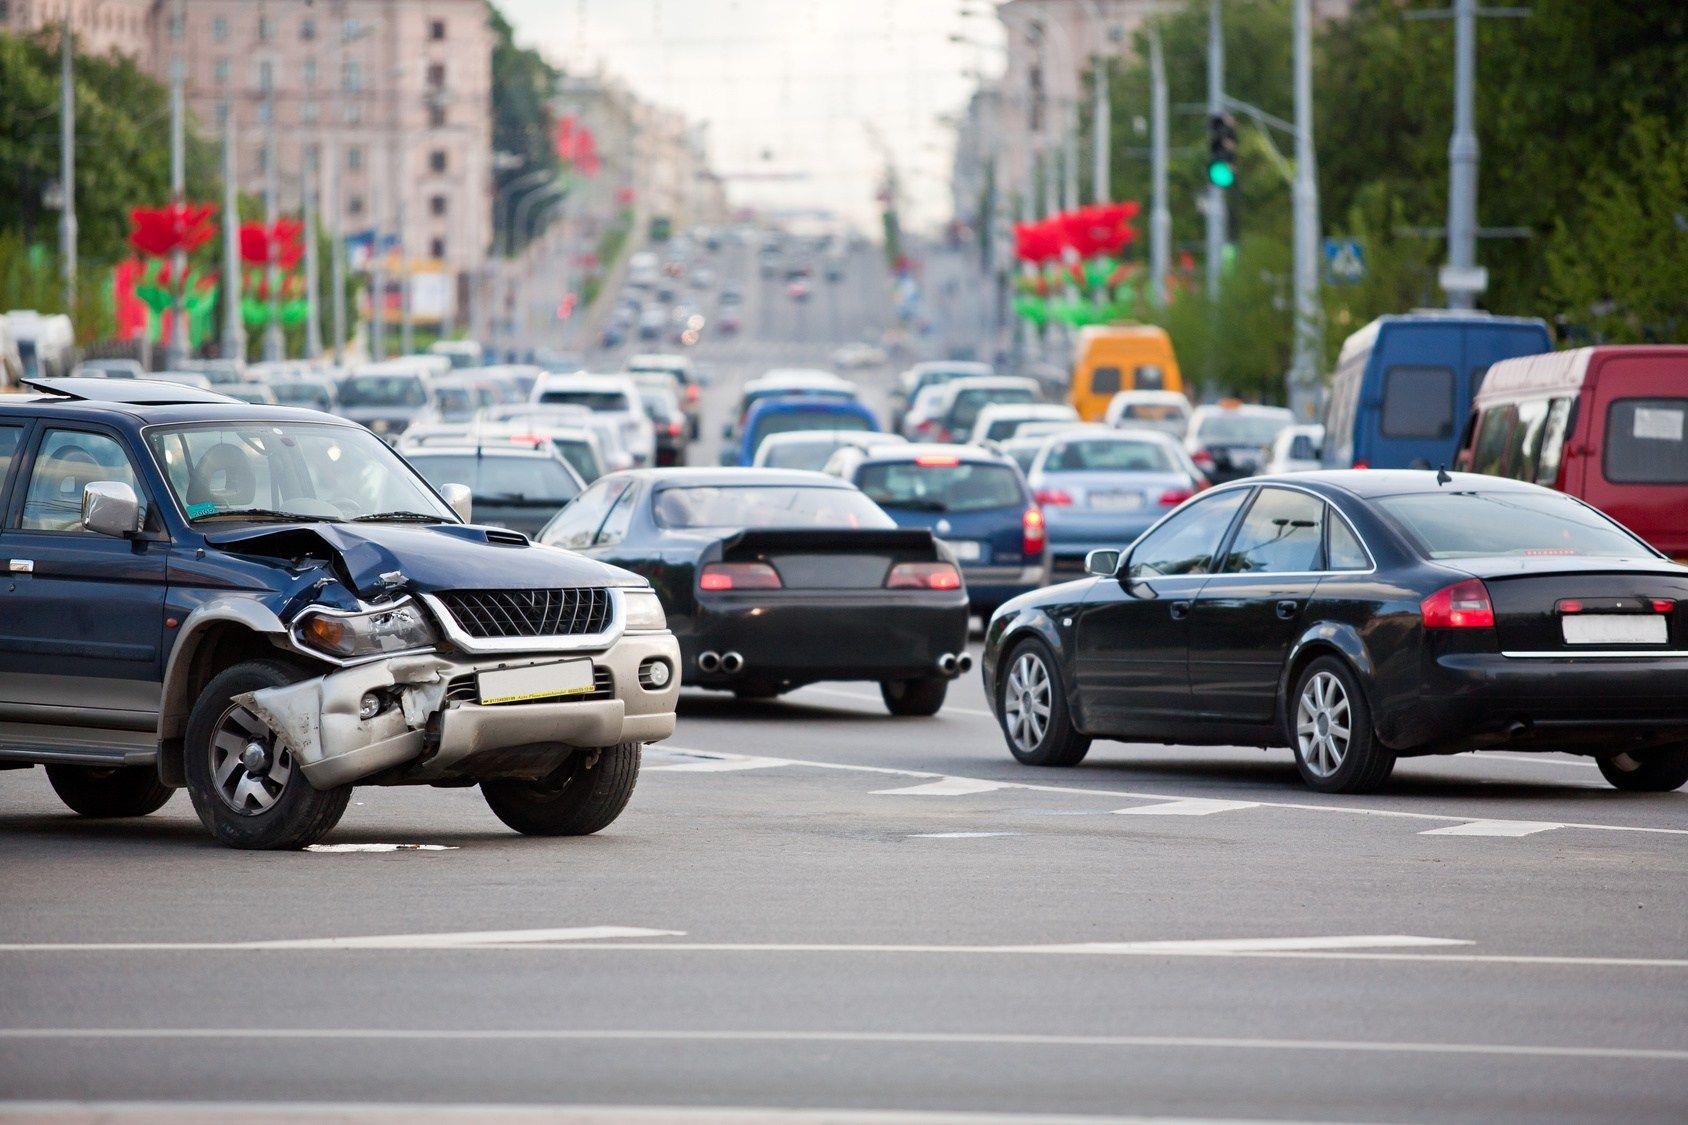 Pin by RandyRozek on Rozek Law Offices, SC Vehicles